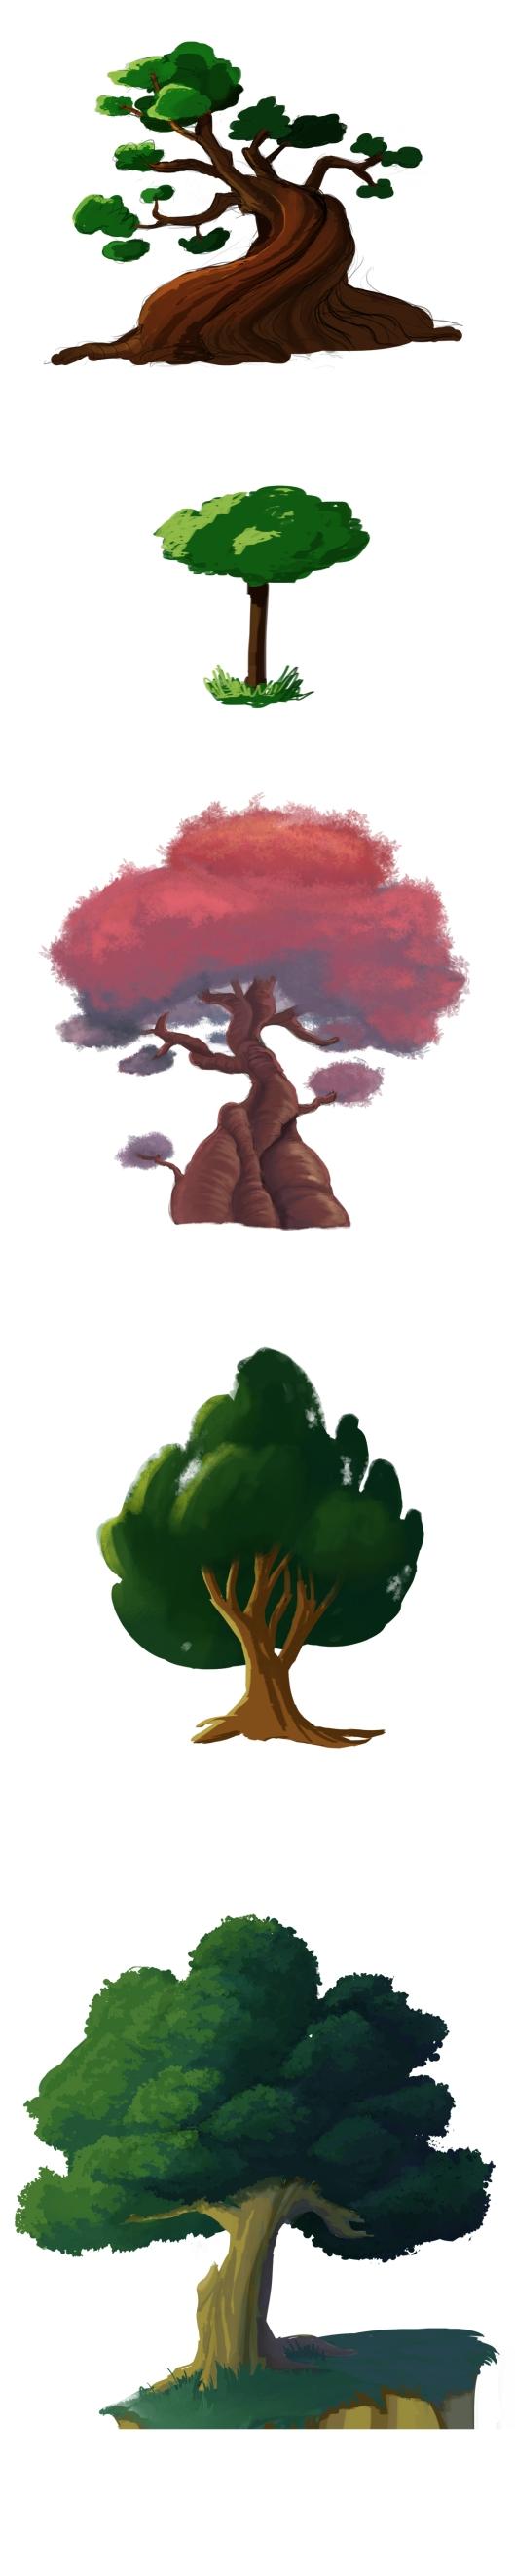 tree styles